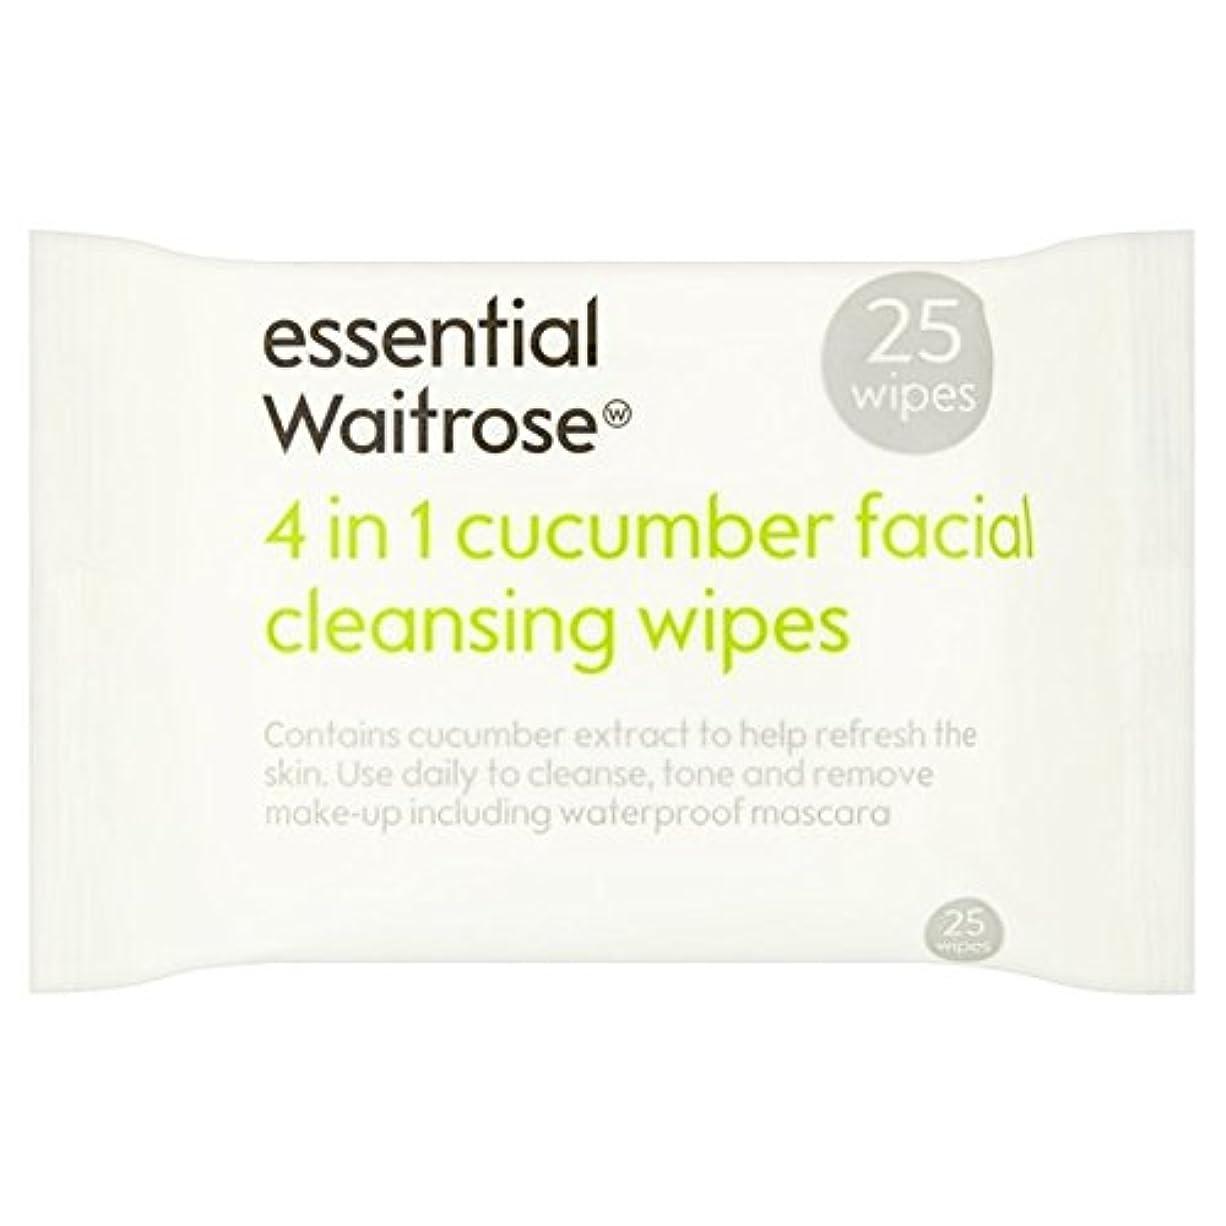 Cucumber Facial Wipes essential Waitrose 25 per pack - キュウリ顔のワイプパックあたり不可欠ウェイトローズ25 [並行輸入品]